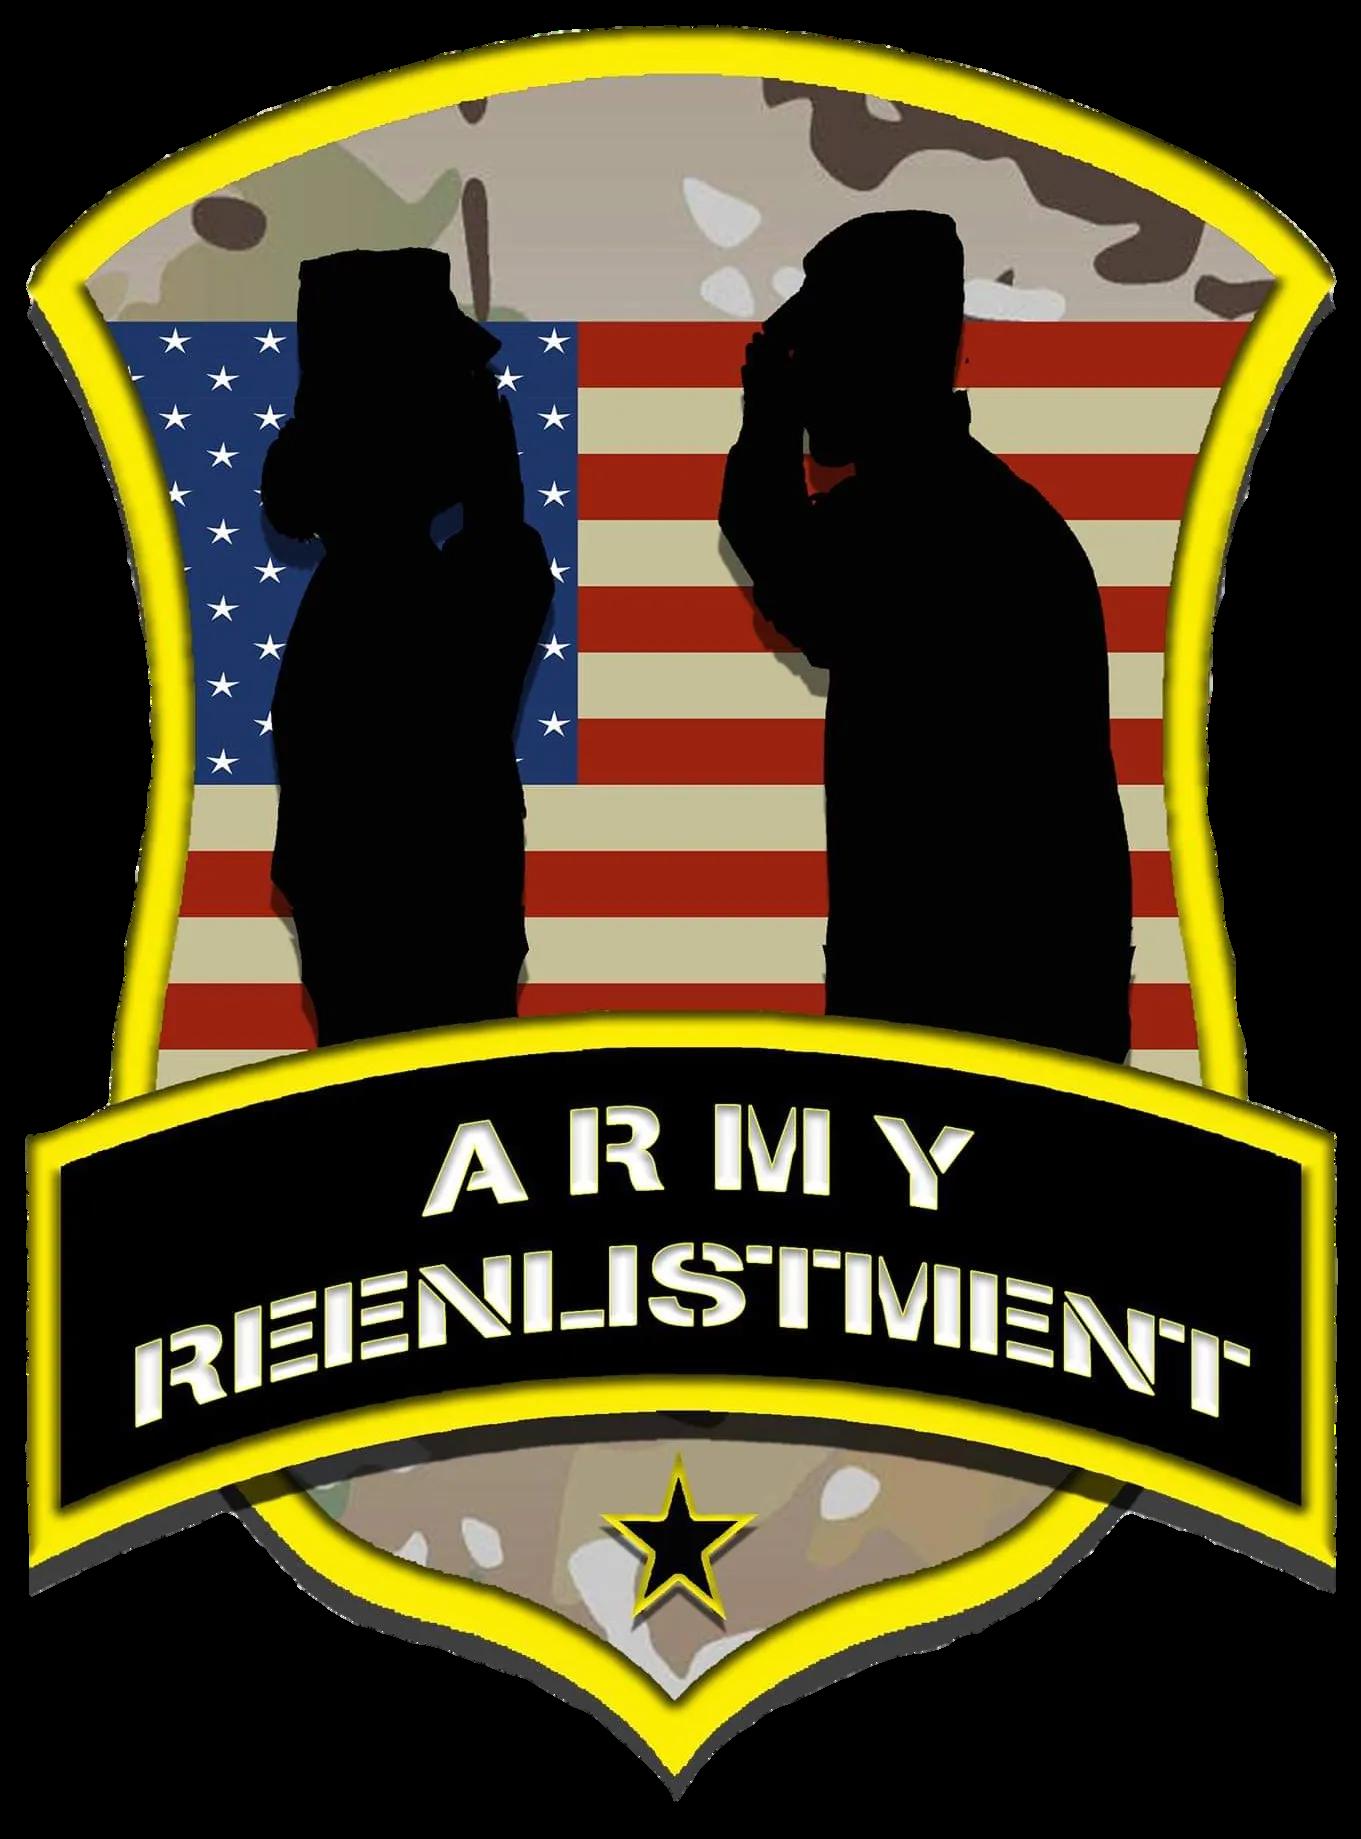 ArmyReenlistment